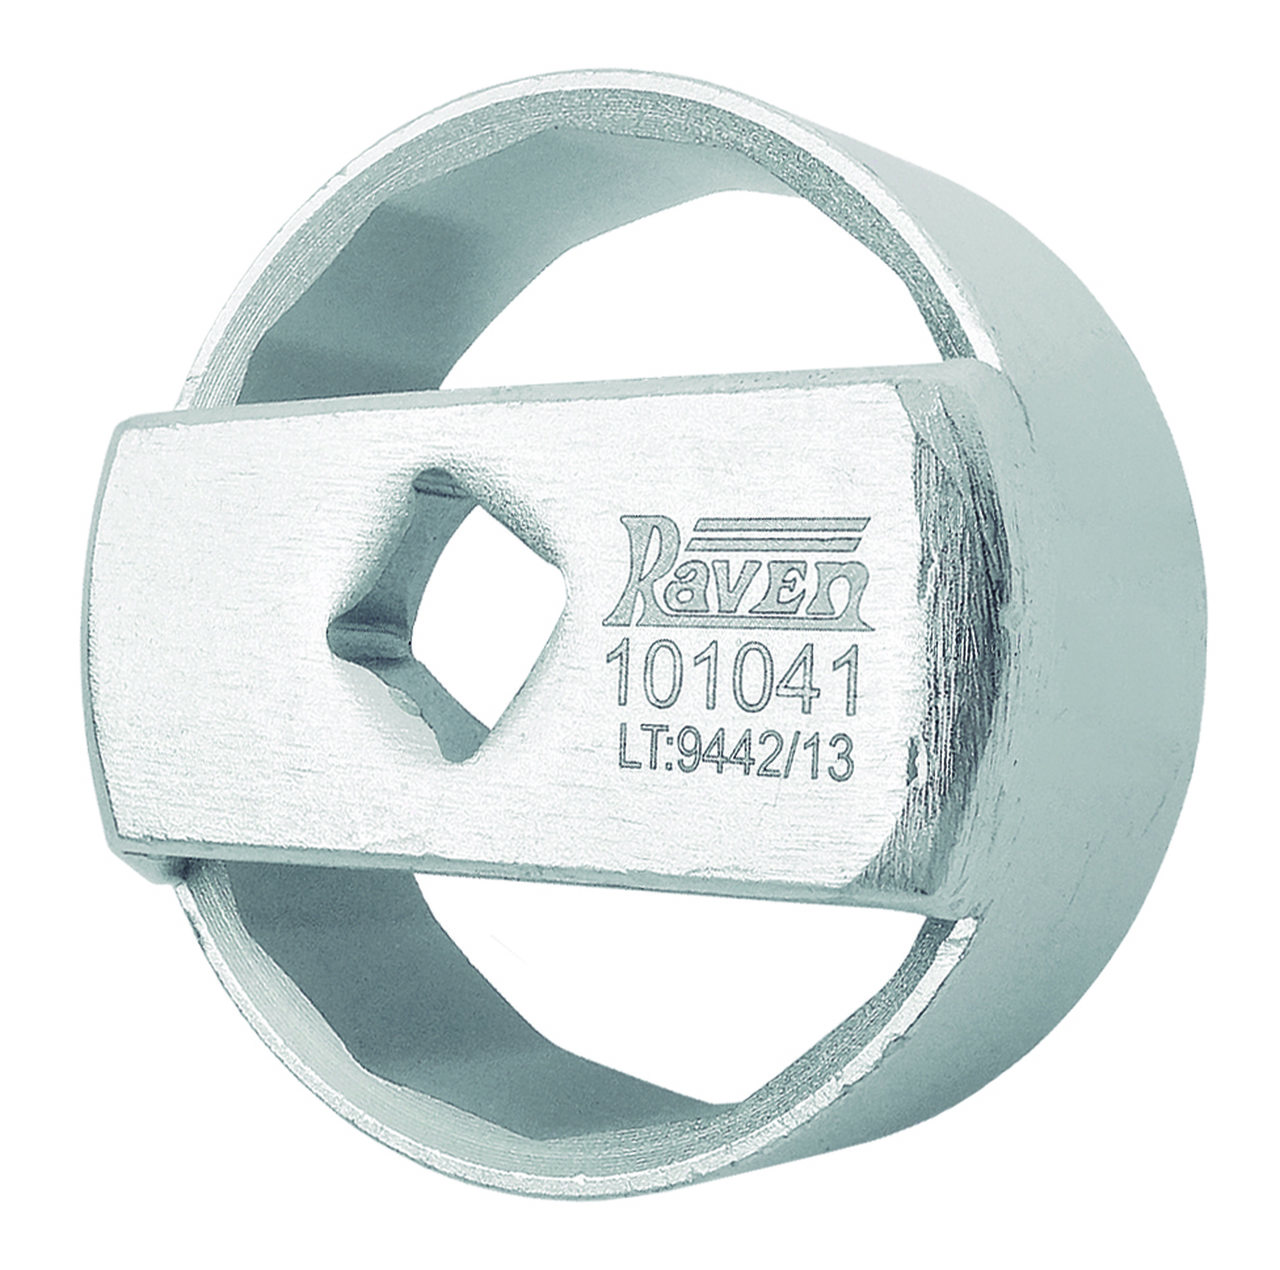 Chave de 71 mm e Encaixe de 1/2 Para filtro de Óleo Hyundai HB20 Raven OUTLINE